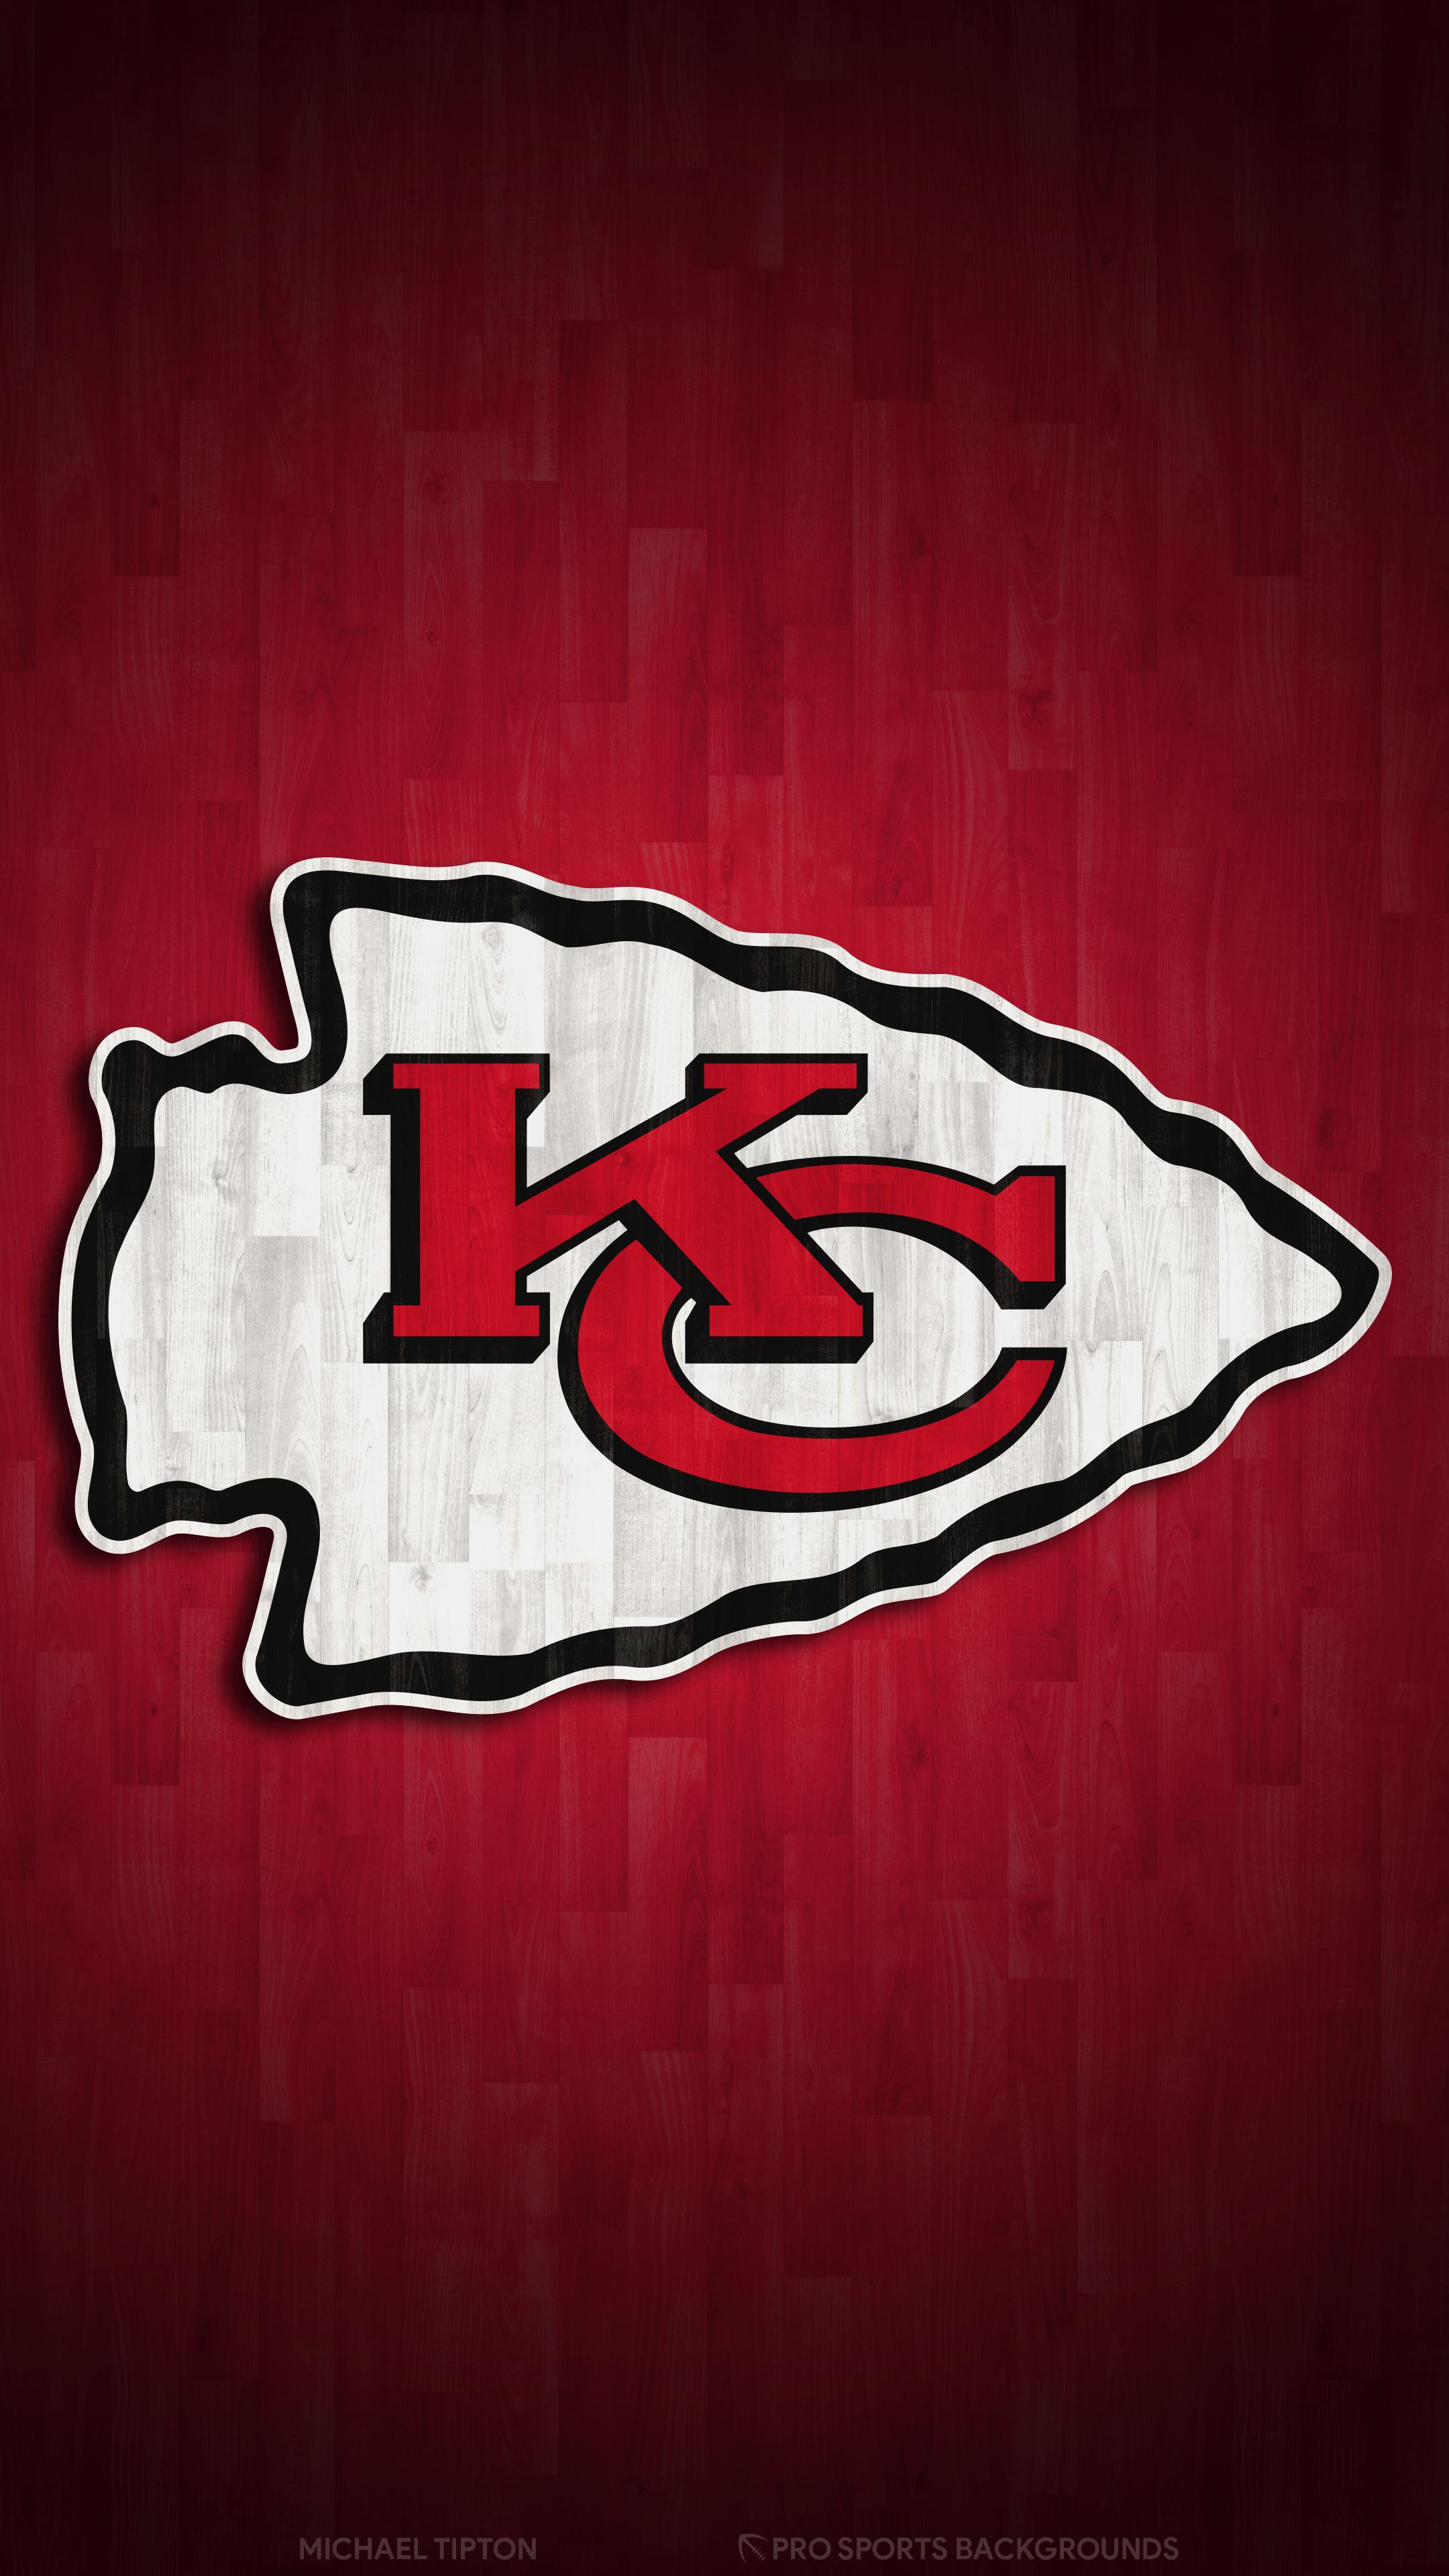 Kansas City Chiefs 2019 Wallpapers - Wallpaper Cave